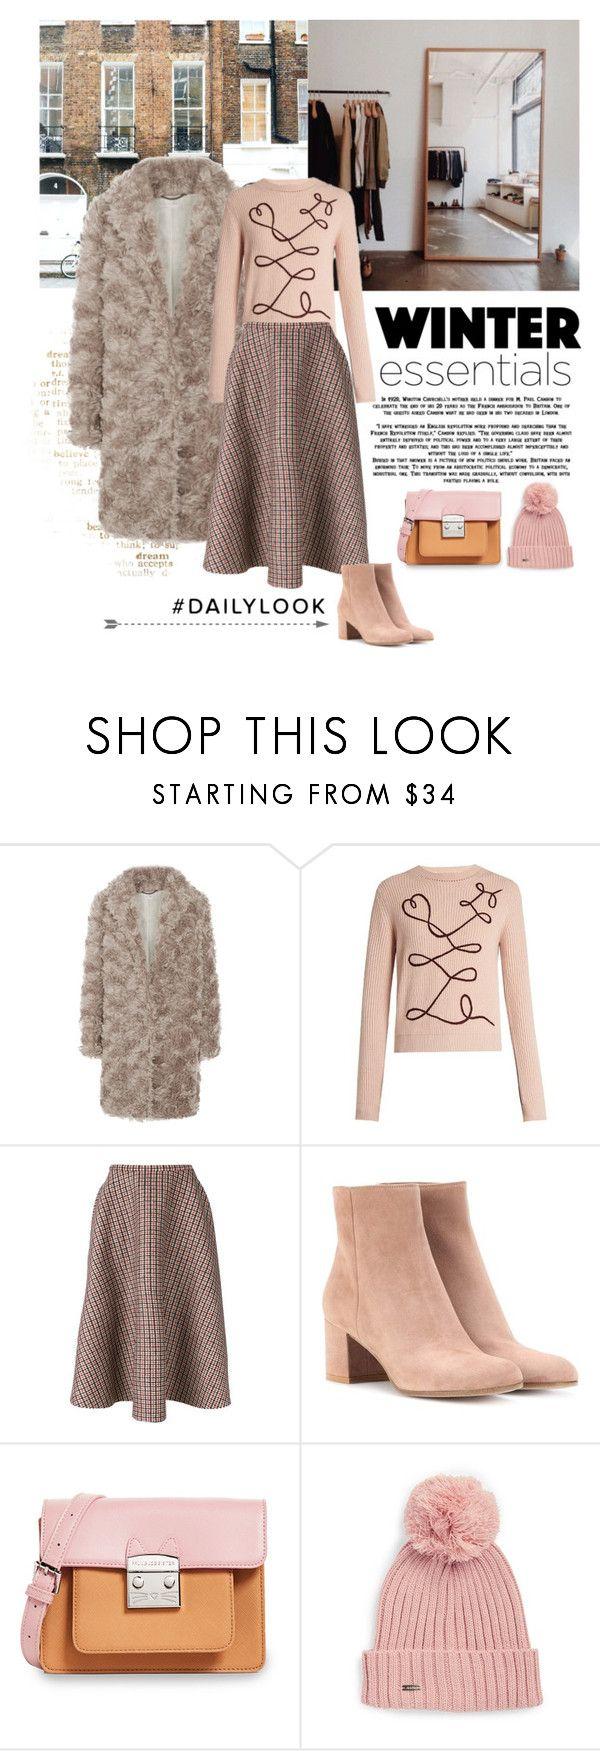 """#dailylook"" by frechelibelle ❤ liked on Polyvore featuring STELLA McCARTNEY, Roksanda, N°21, Gianvito Rossi, Paul & Joe Sister and Calvin Klein"